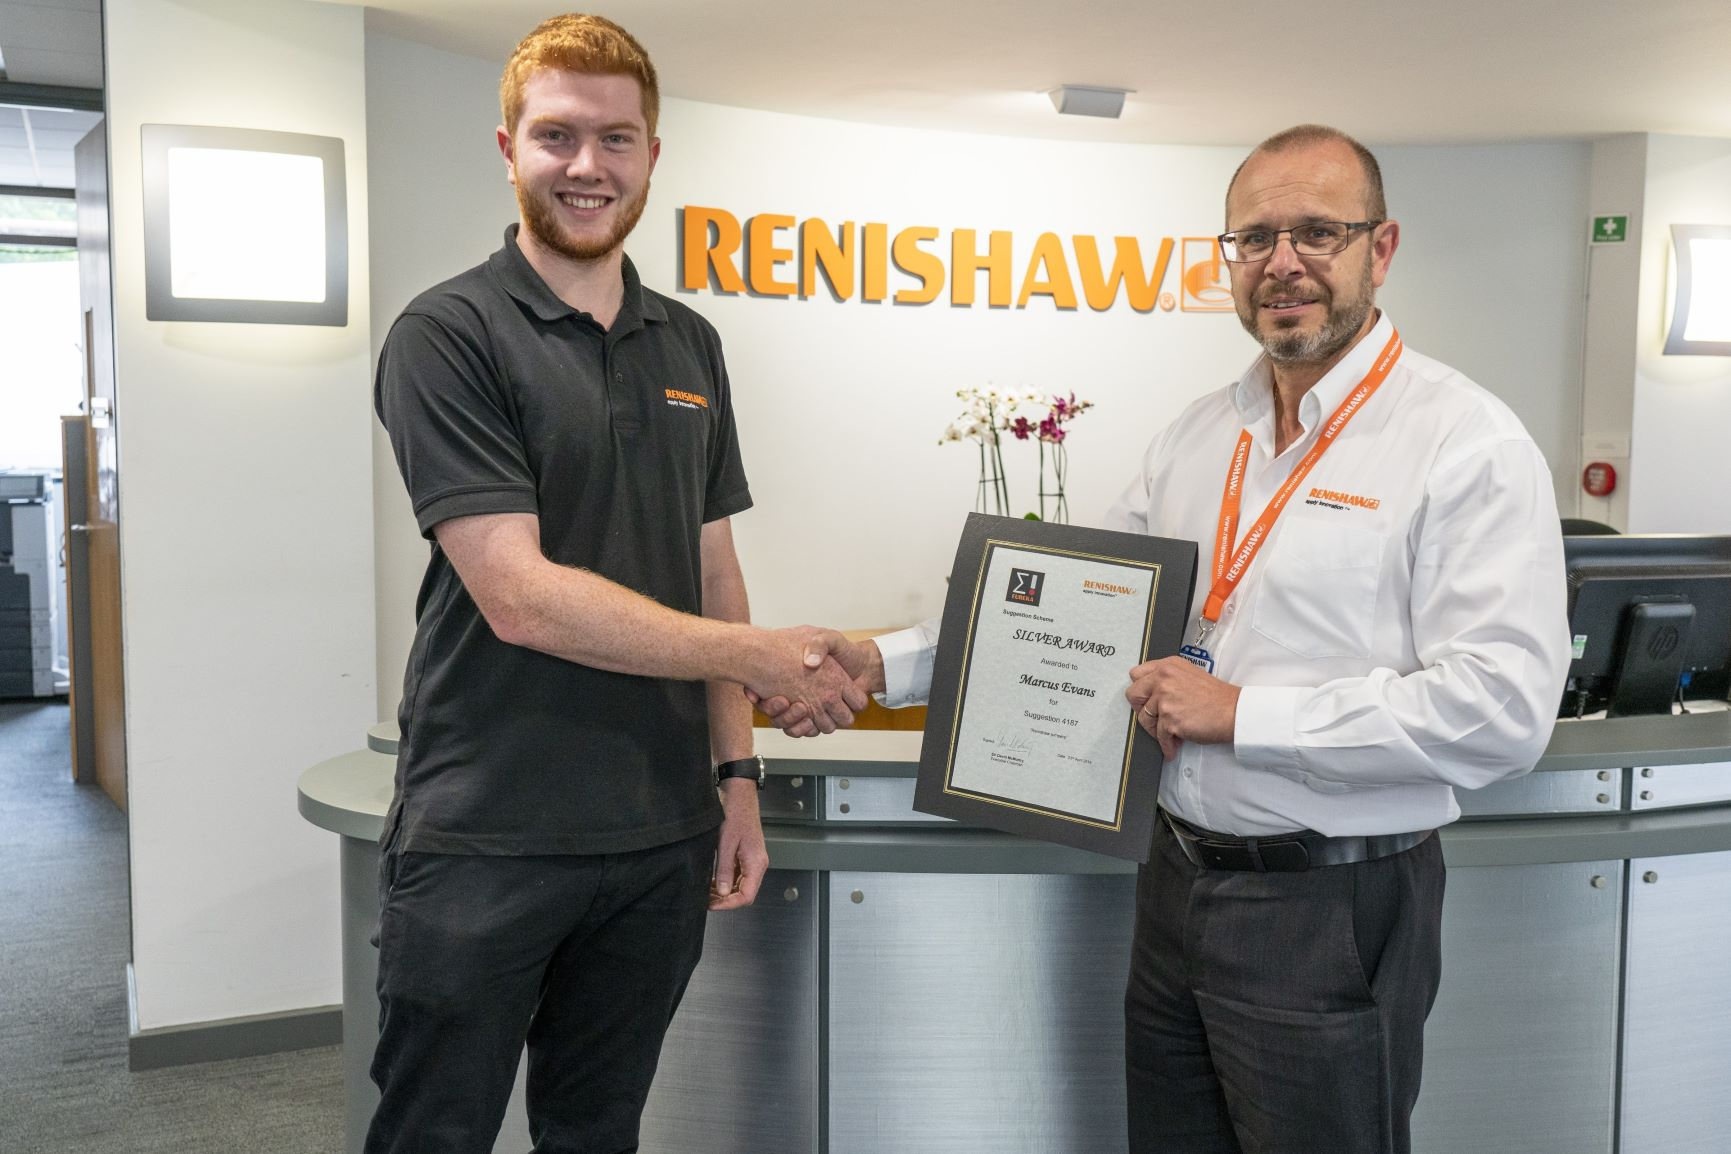 Marcus Evans (Left) is a Mechanical Engineer Apprentice at Renishaw. Image via Renishaw.